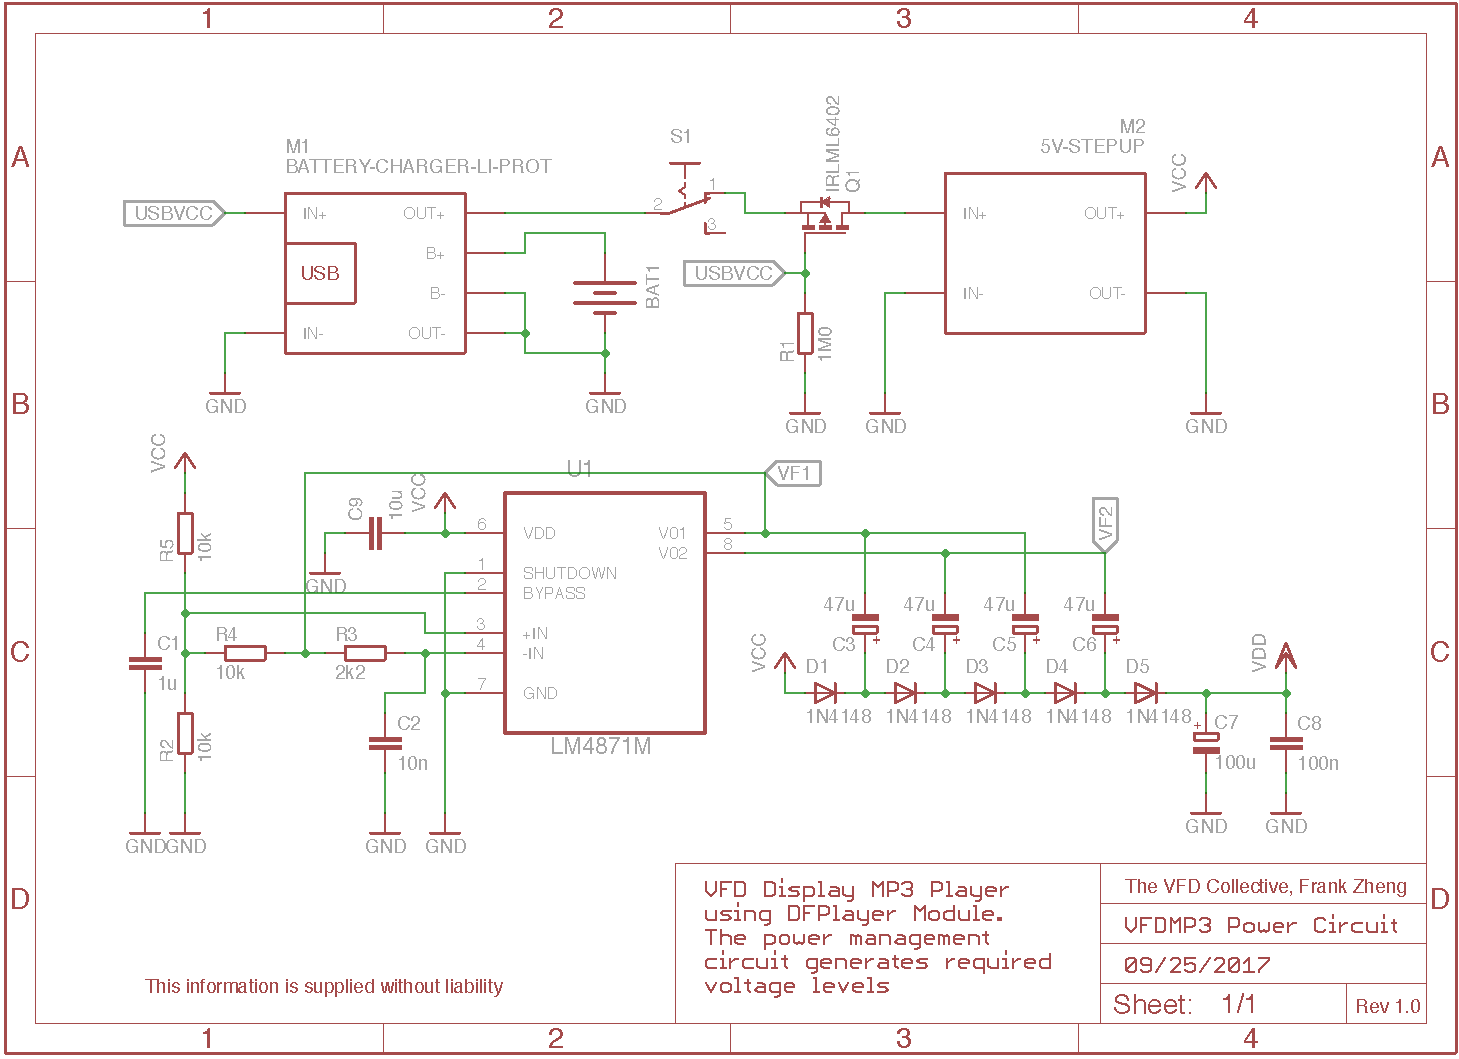 Power Management Circuit